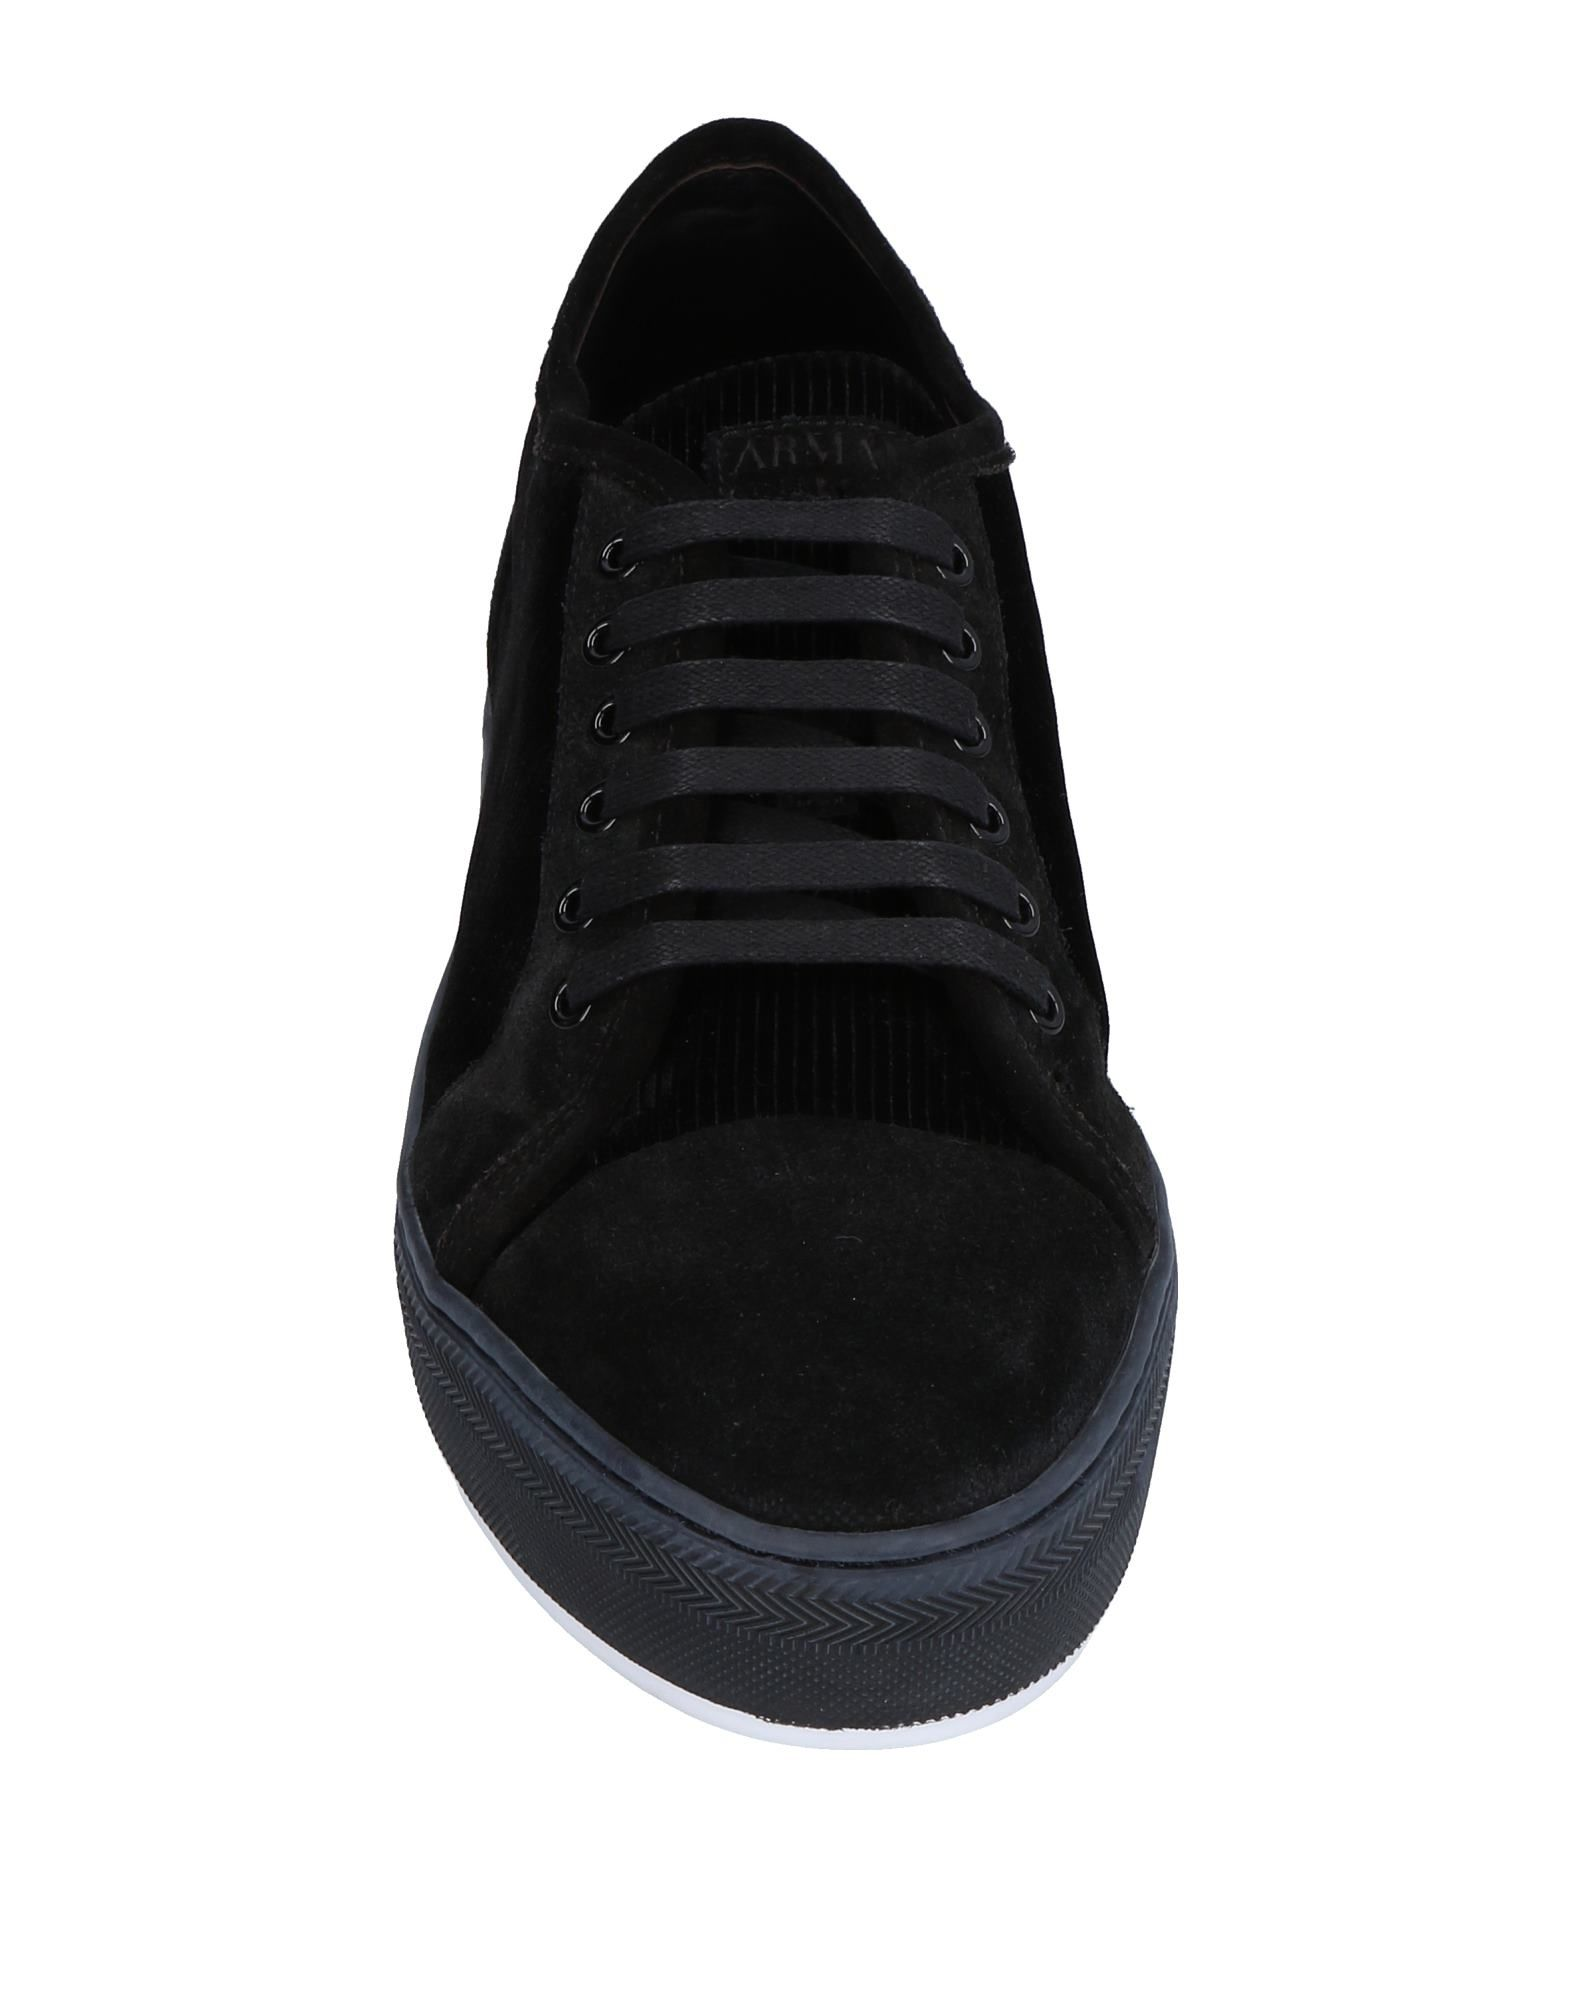 Armani Collezioni Sneakers Qualität Herren  11514600PE Gute Qualität Sneakers beliebte Schuhe 050ae3